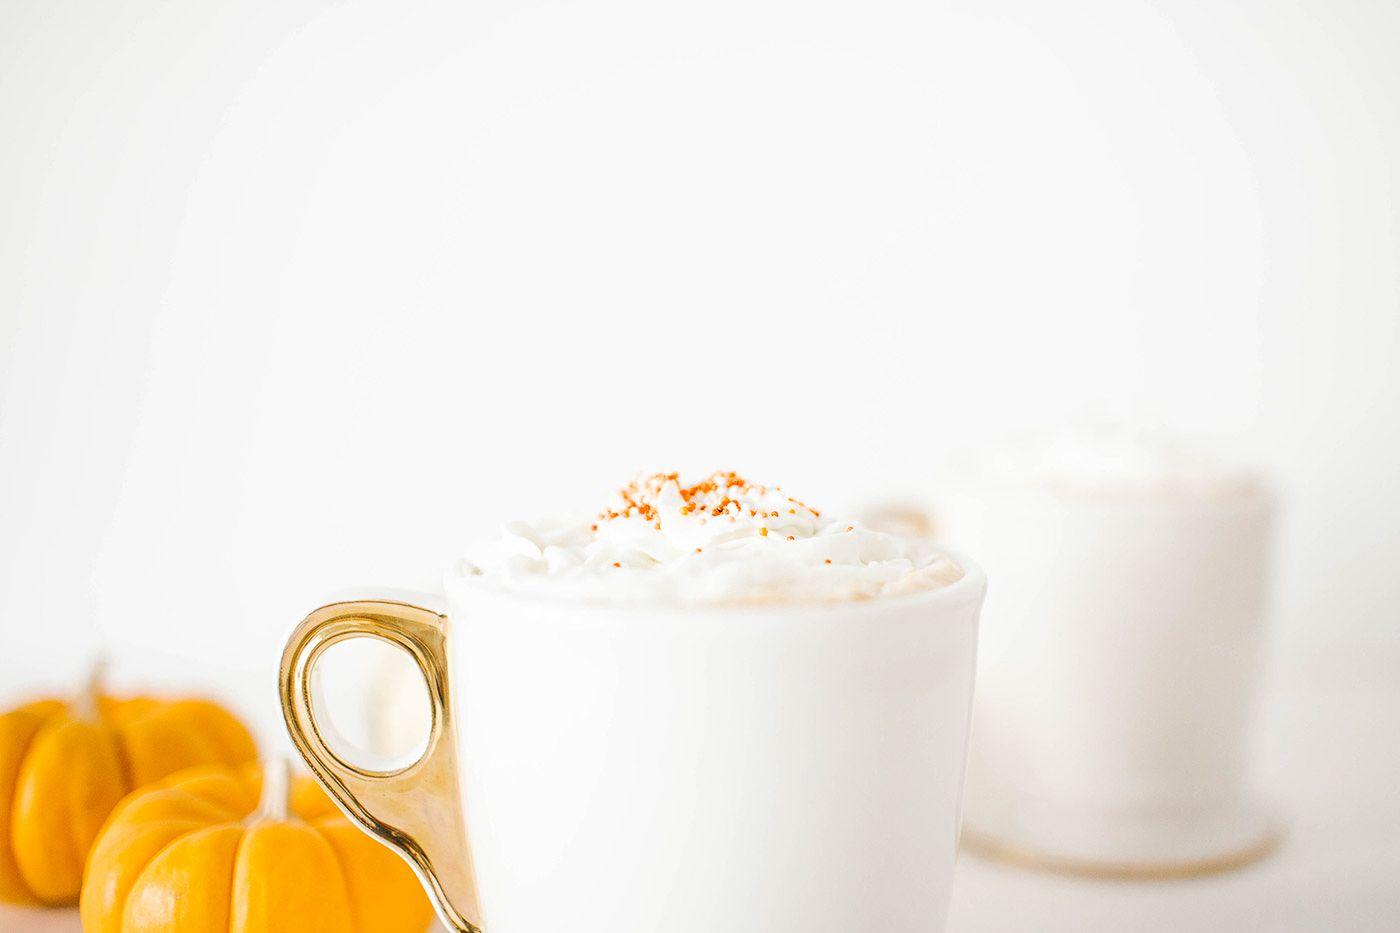 Spiked Pumpkin Hot Chocolate Recipe | GRAY MALIN